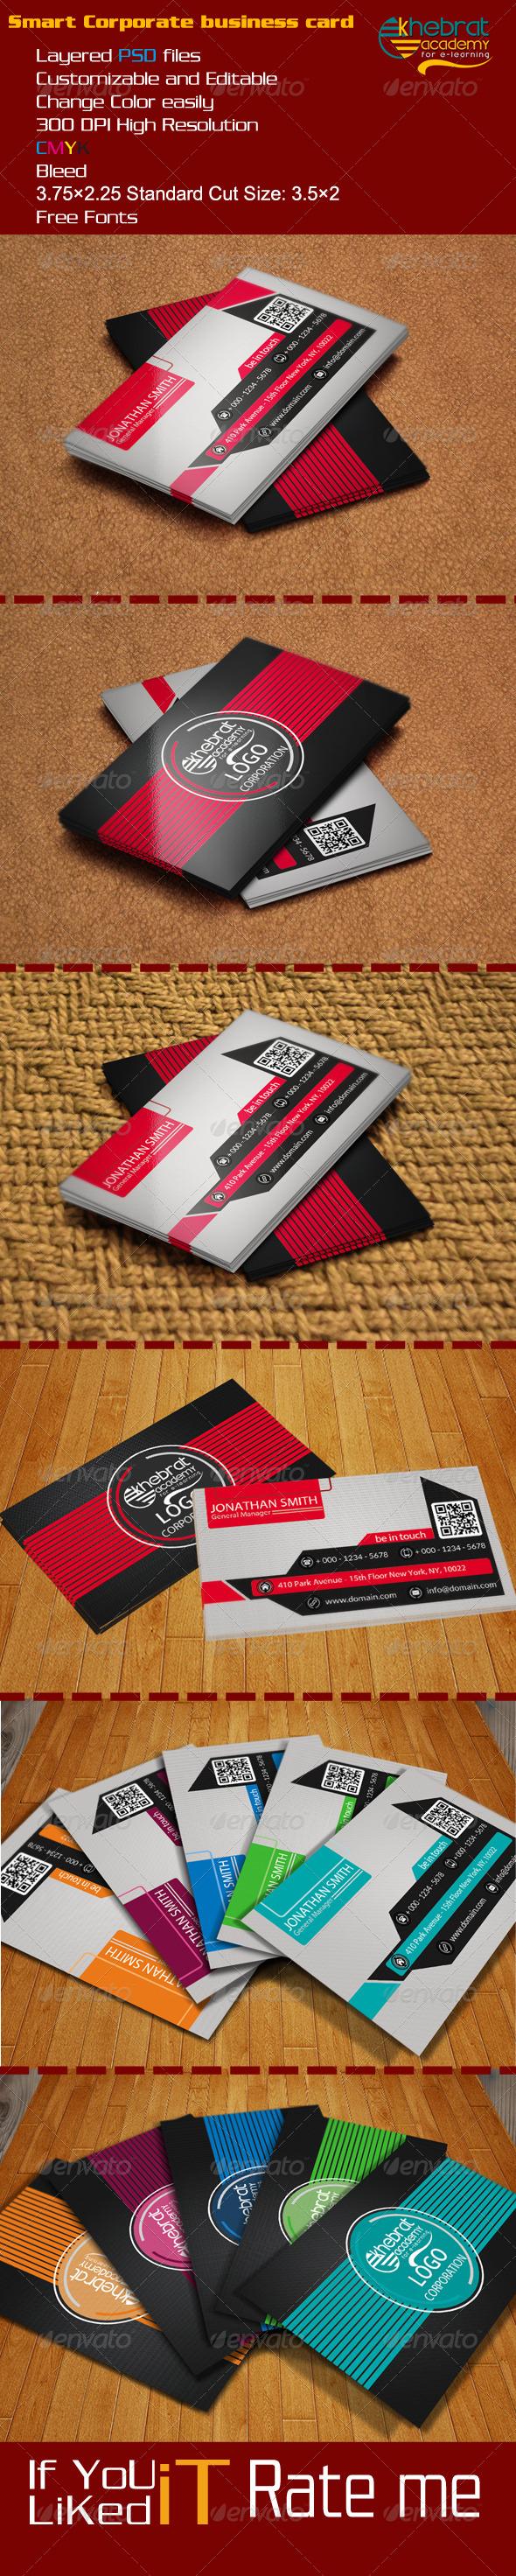 GraphicRiver Smart Corporate business card 6958230